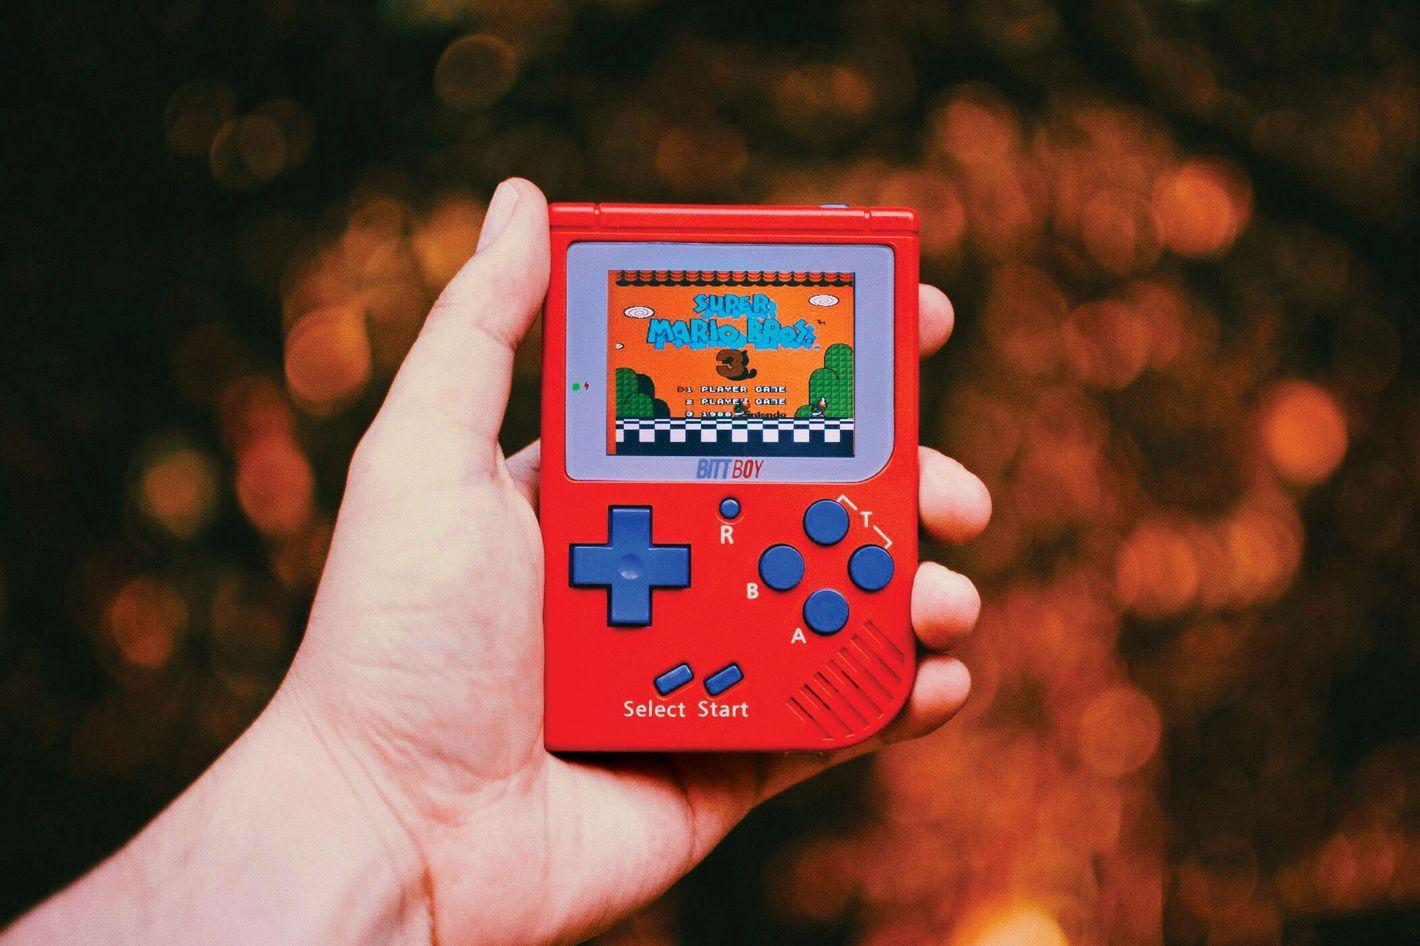 BittBoy FC Mini Handheld